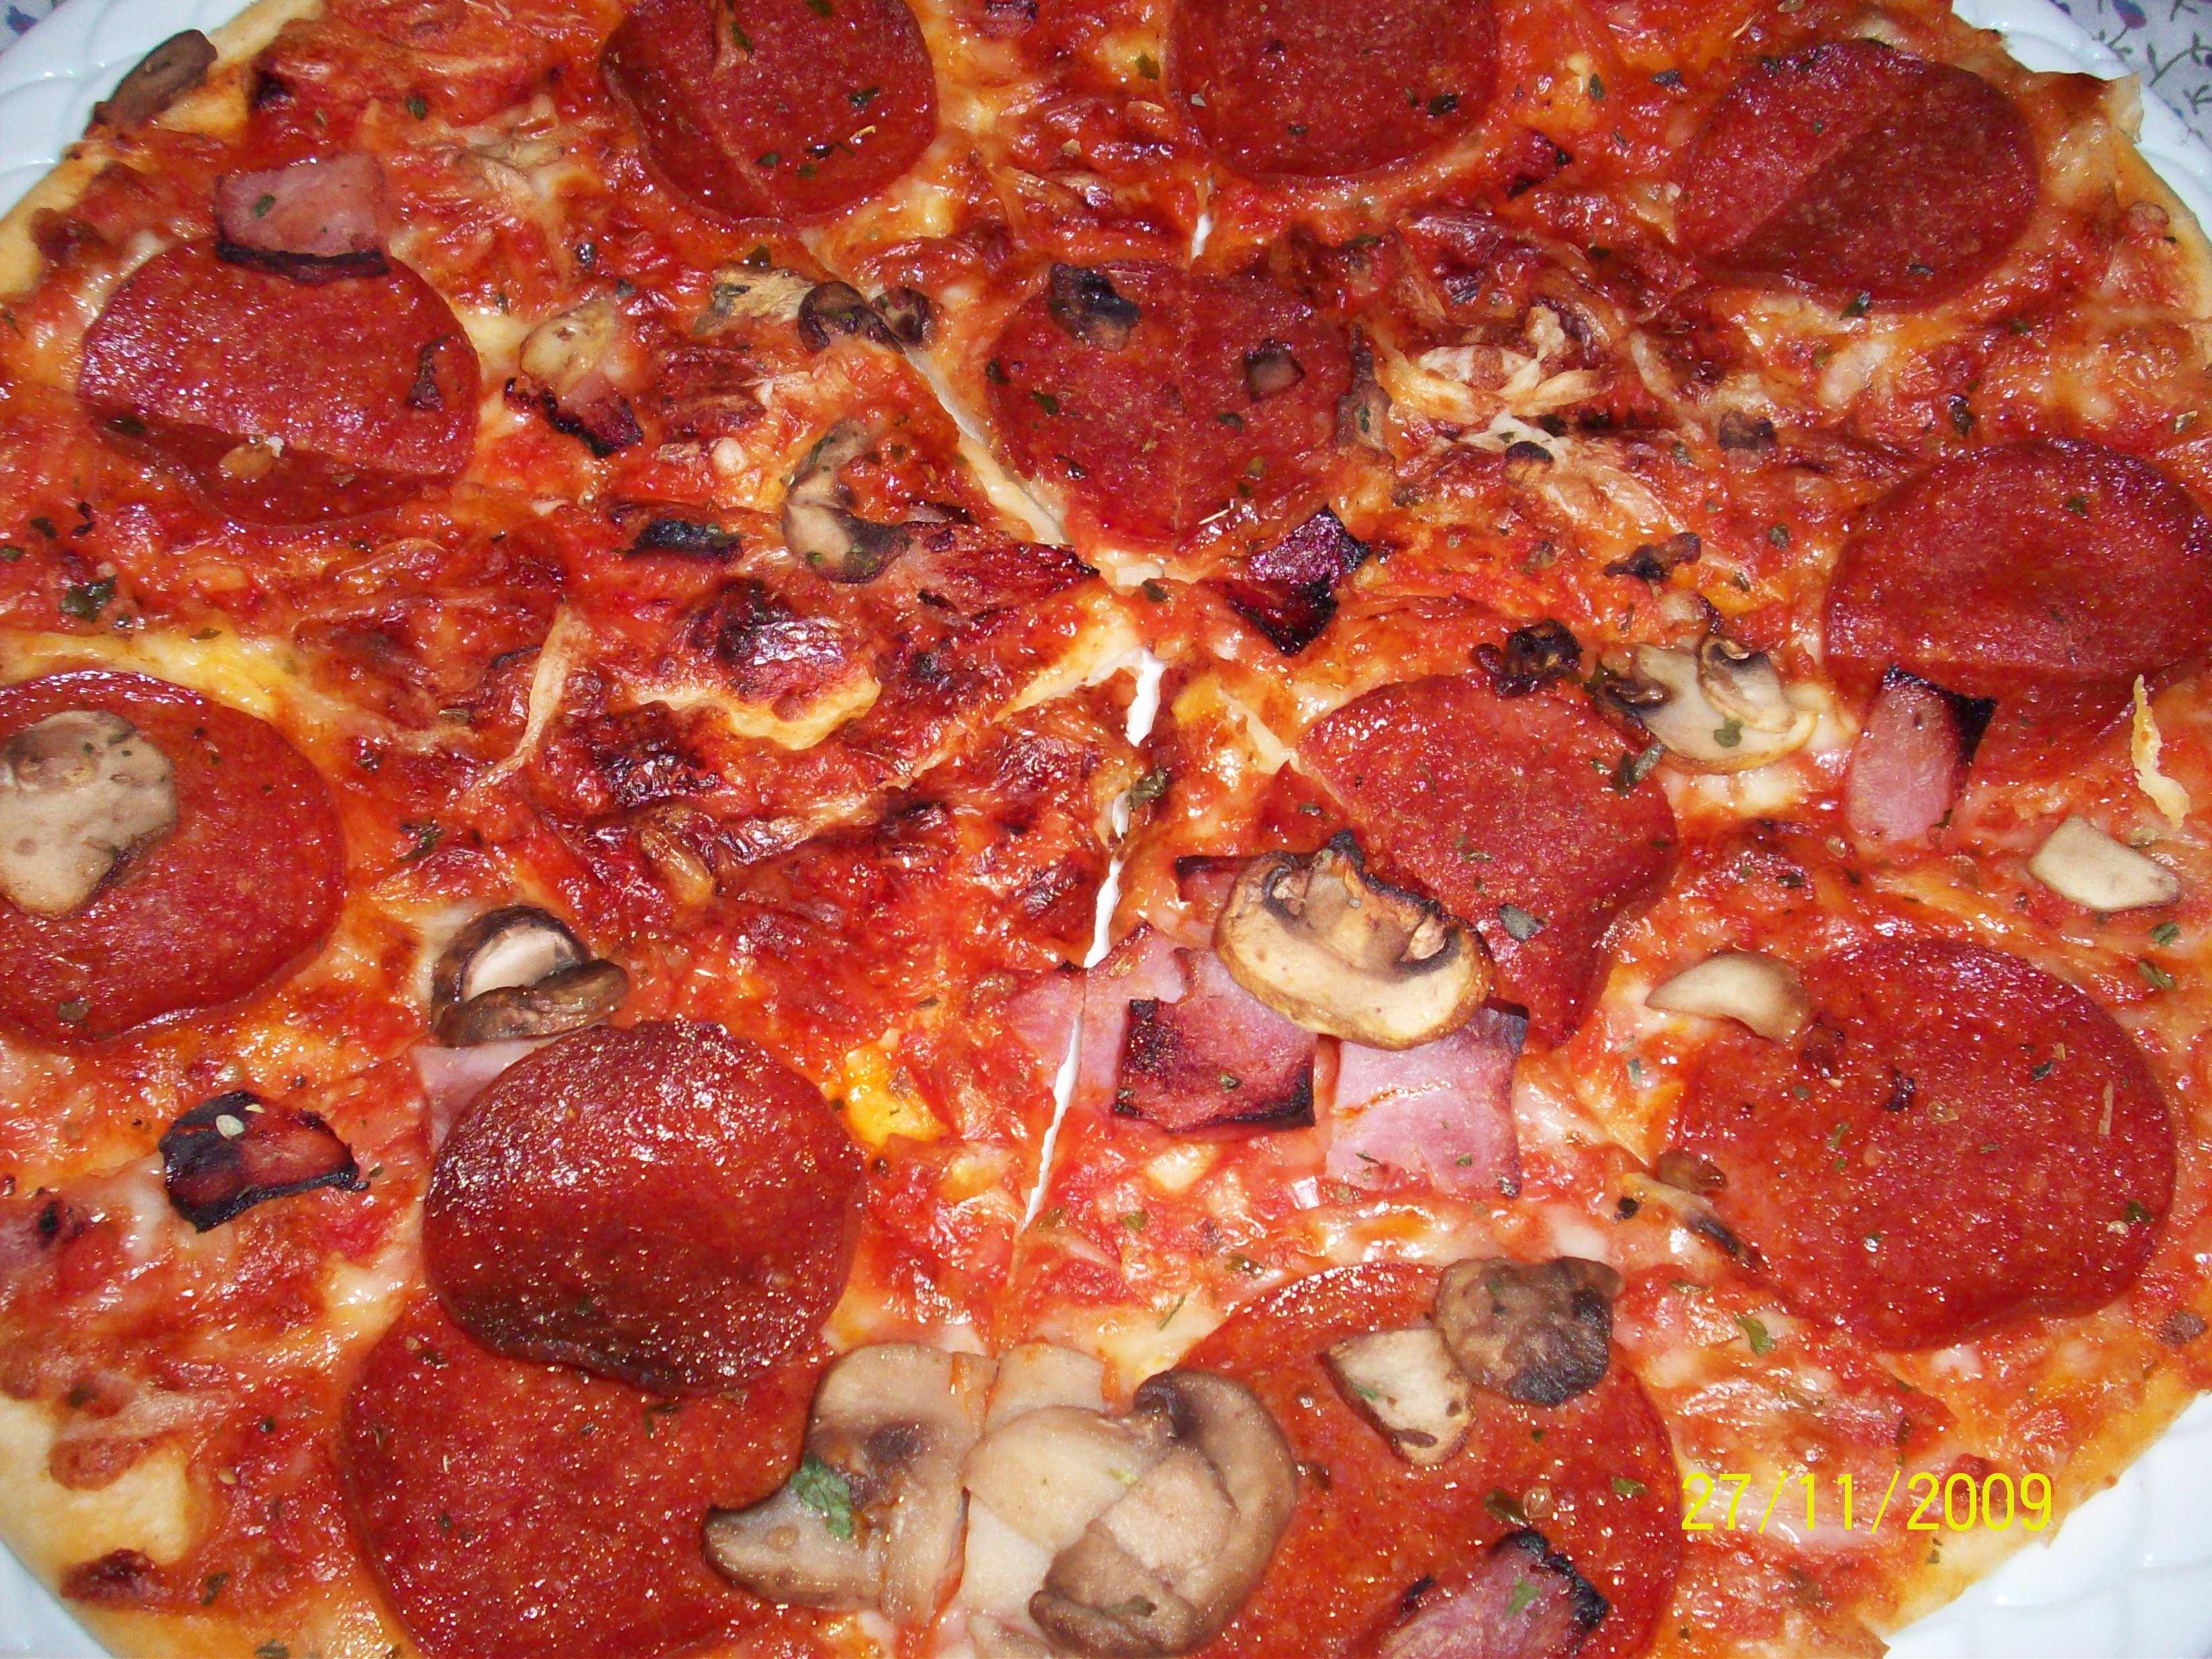 https://foodloader.net/cutie_2009-11-27_Pepperoni_Pizza.jpg